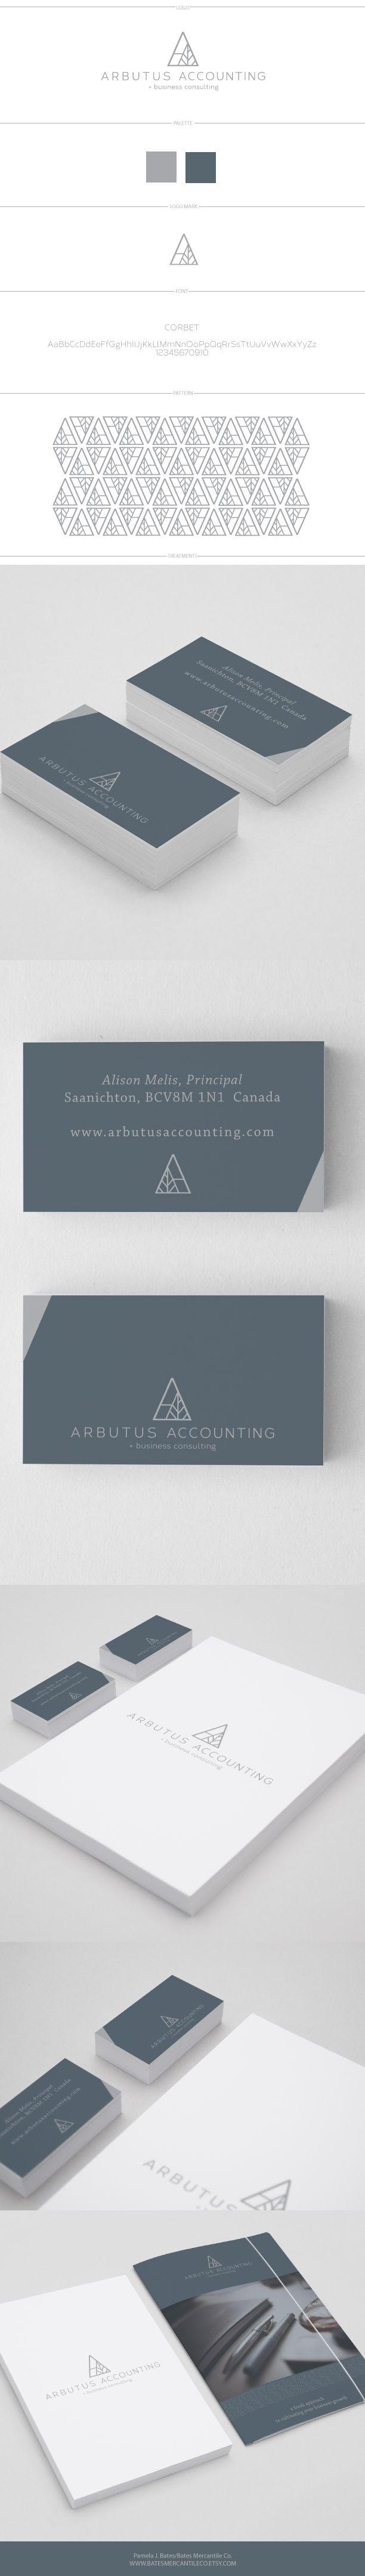 logo design for Arbutus Accounting by Pamela J. Bates, Bates Mercantile Co. #logo #logo design #graphic design #branding #branding design #collateral #accounting logo #business logo